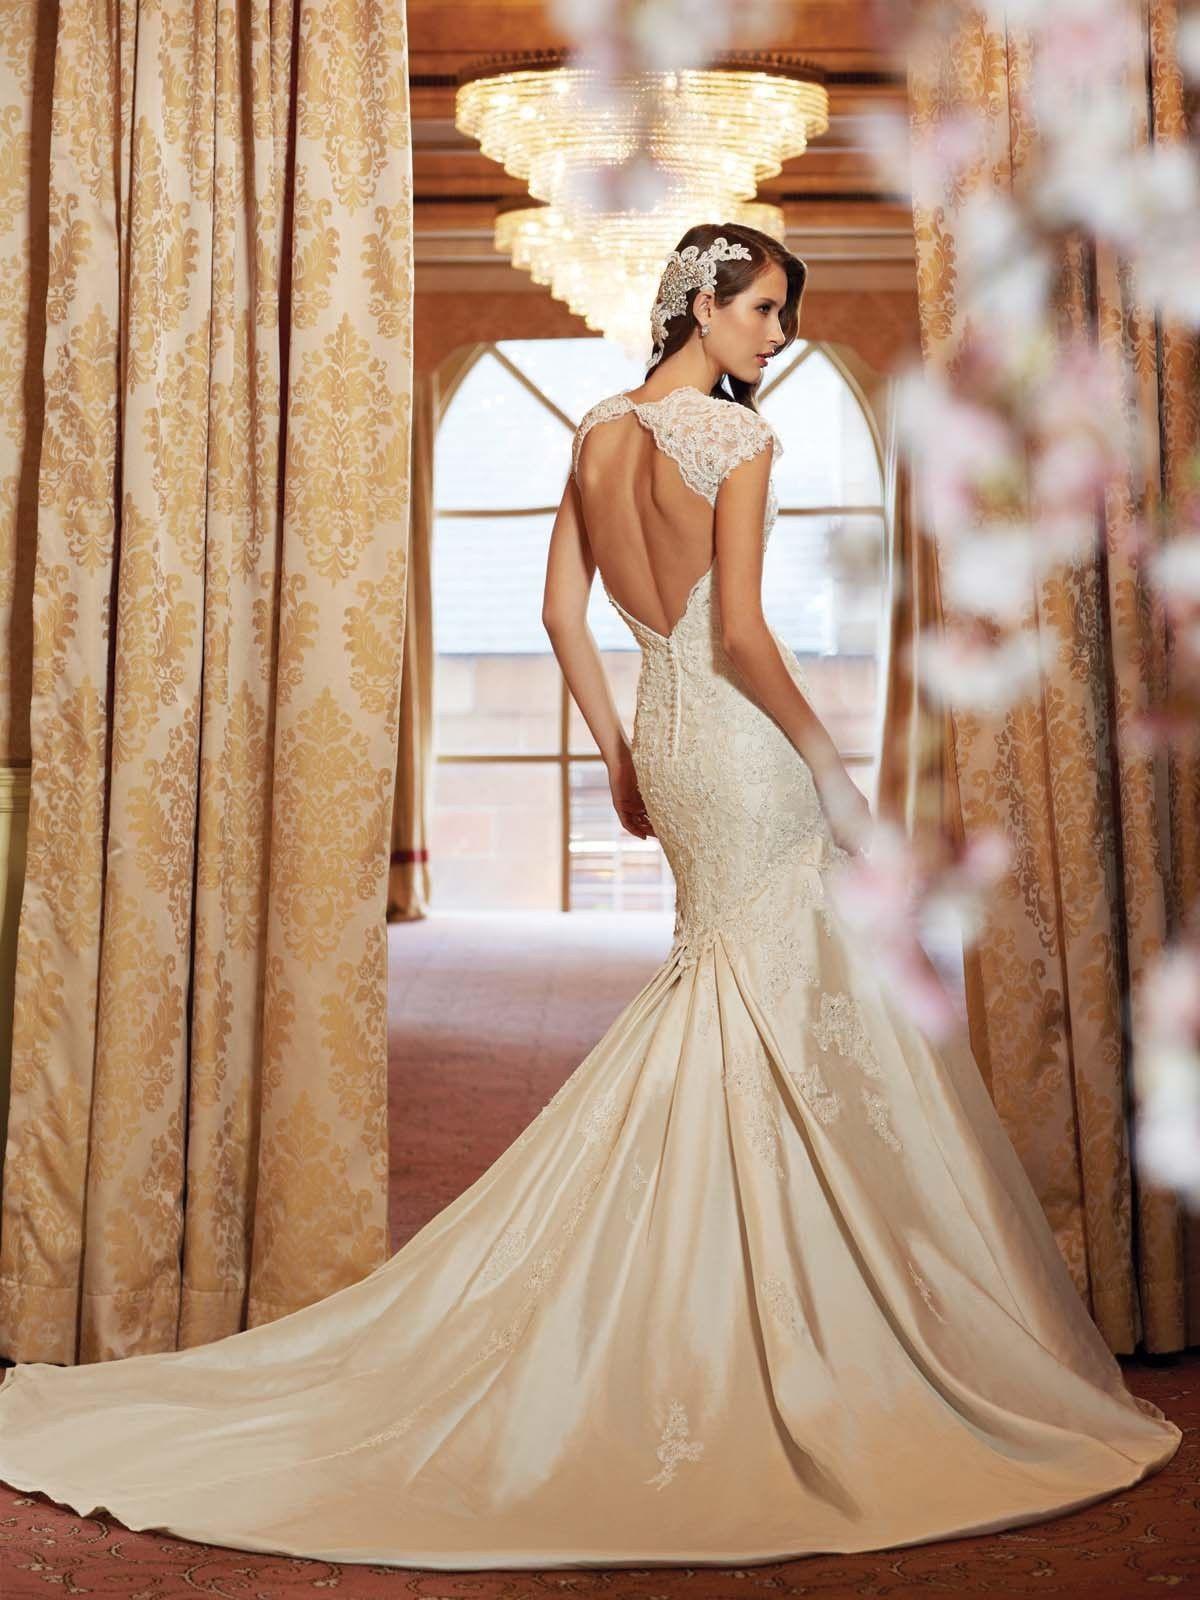 Silk-Backless-Wedding-Dresses- | Backlees Wedding Dress | Pinterest ...